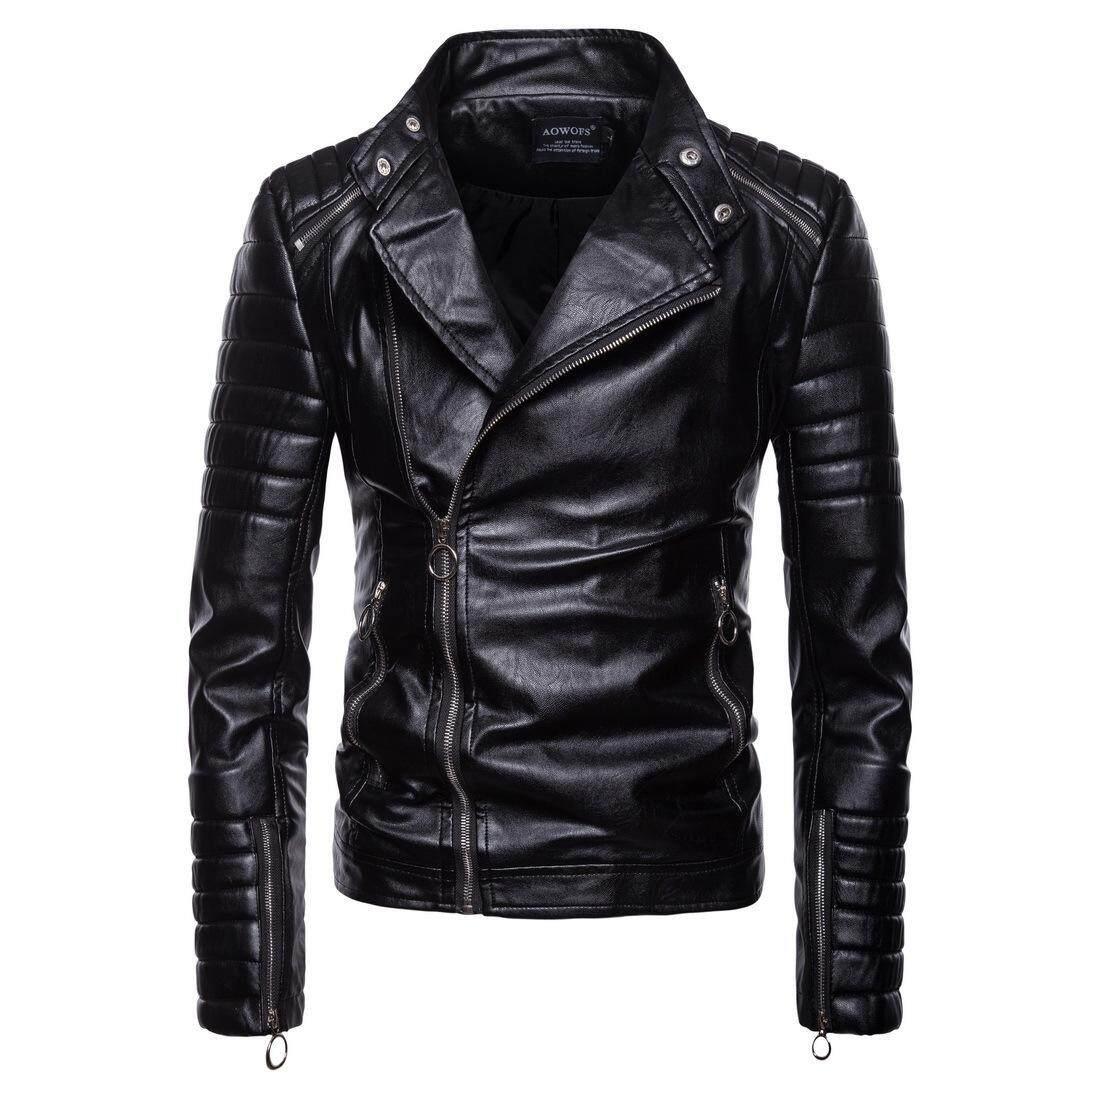 8a902b332 Josin Men s Motorcycle Biker Jacket Korean Style Genuine Cow Leather ...